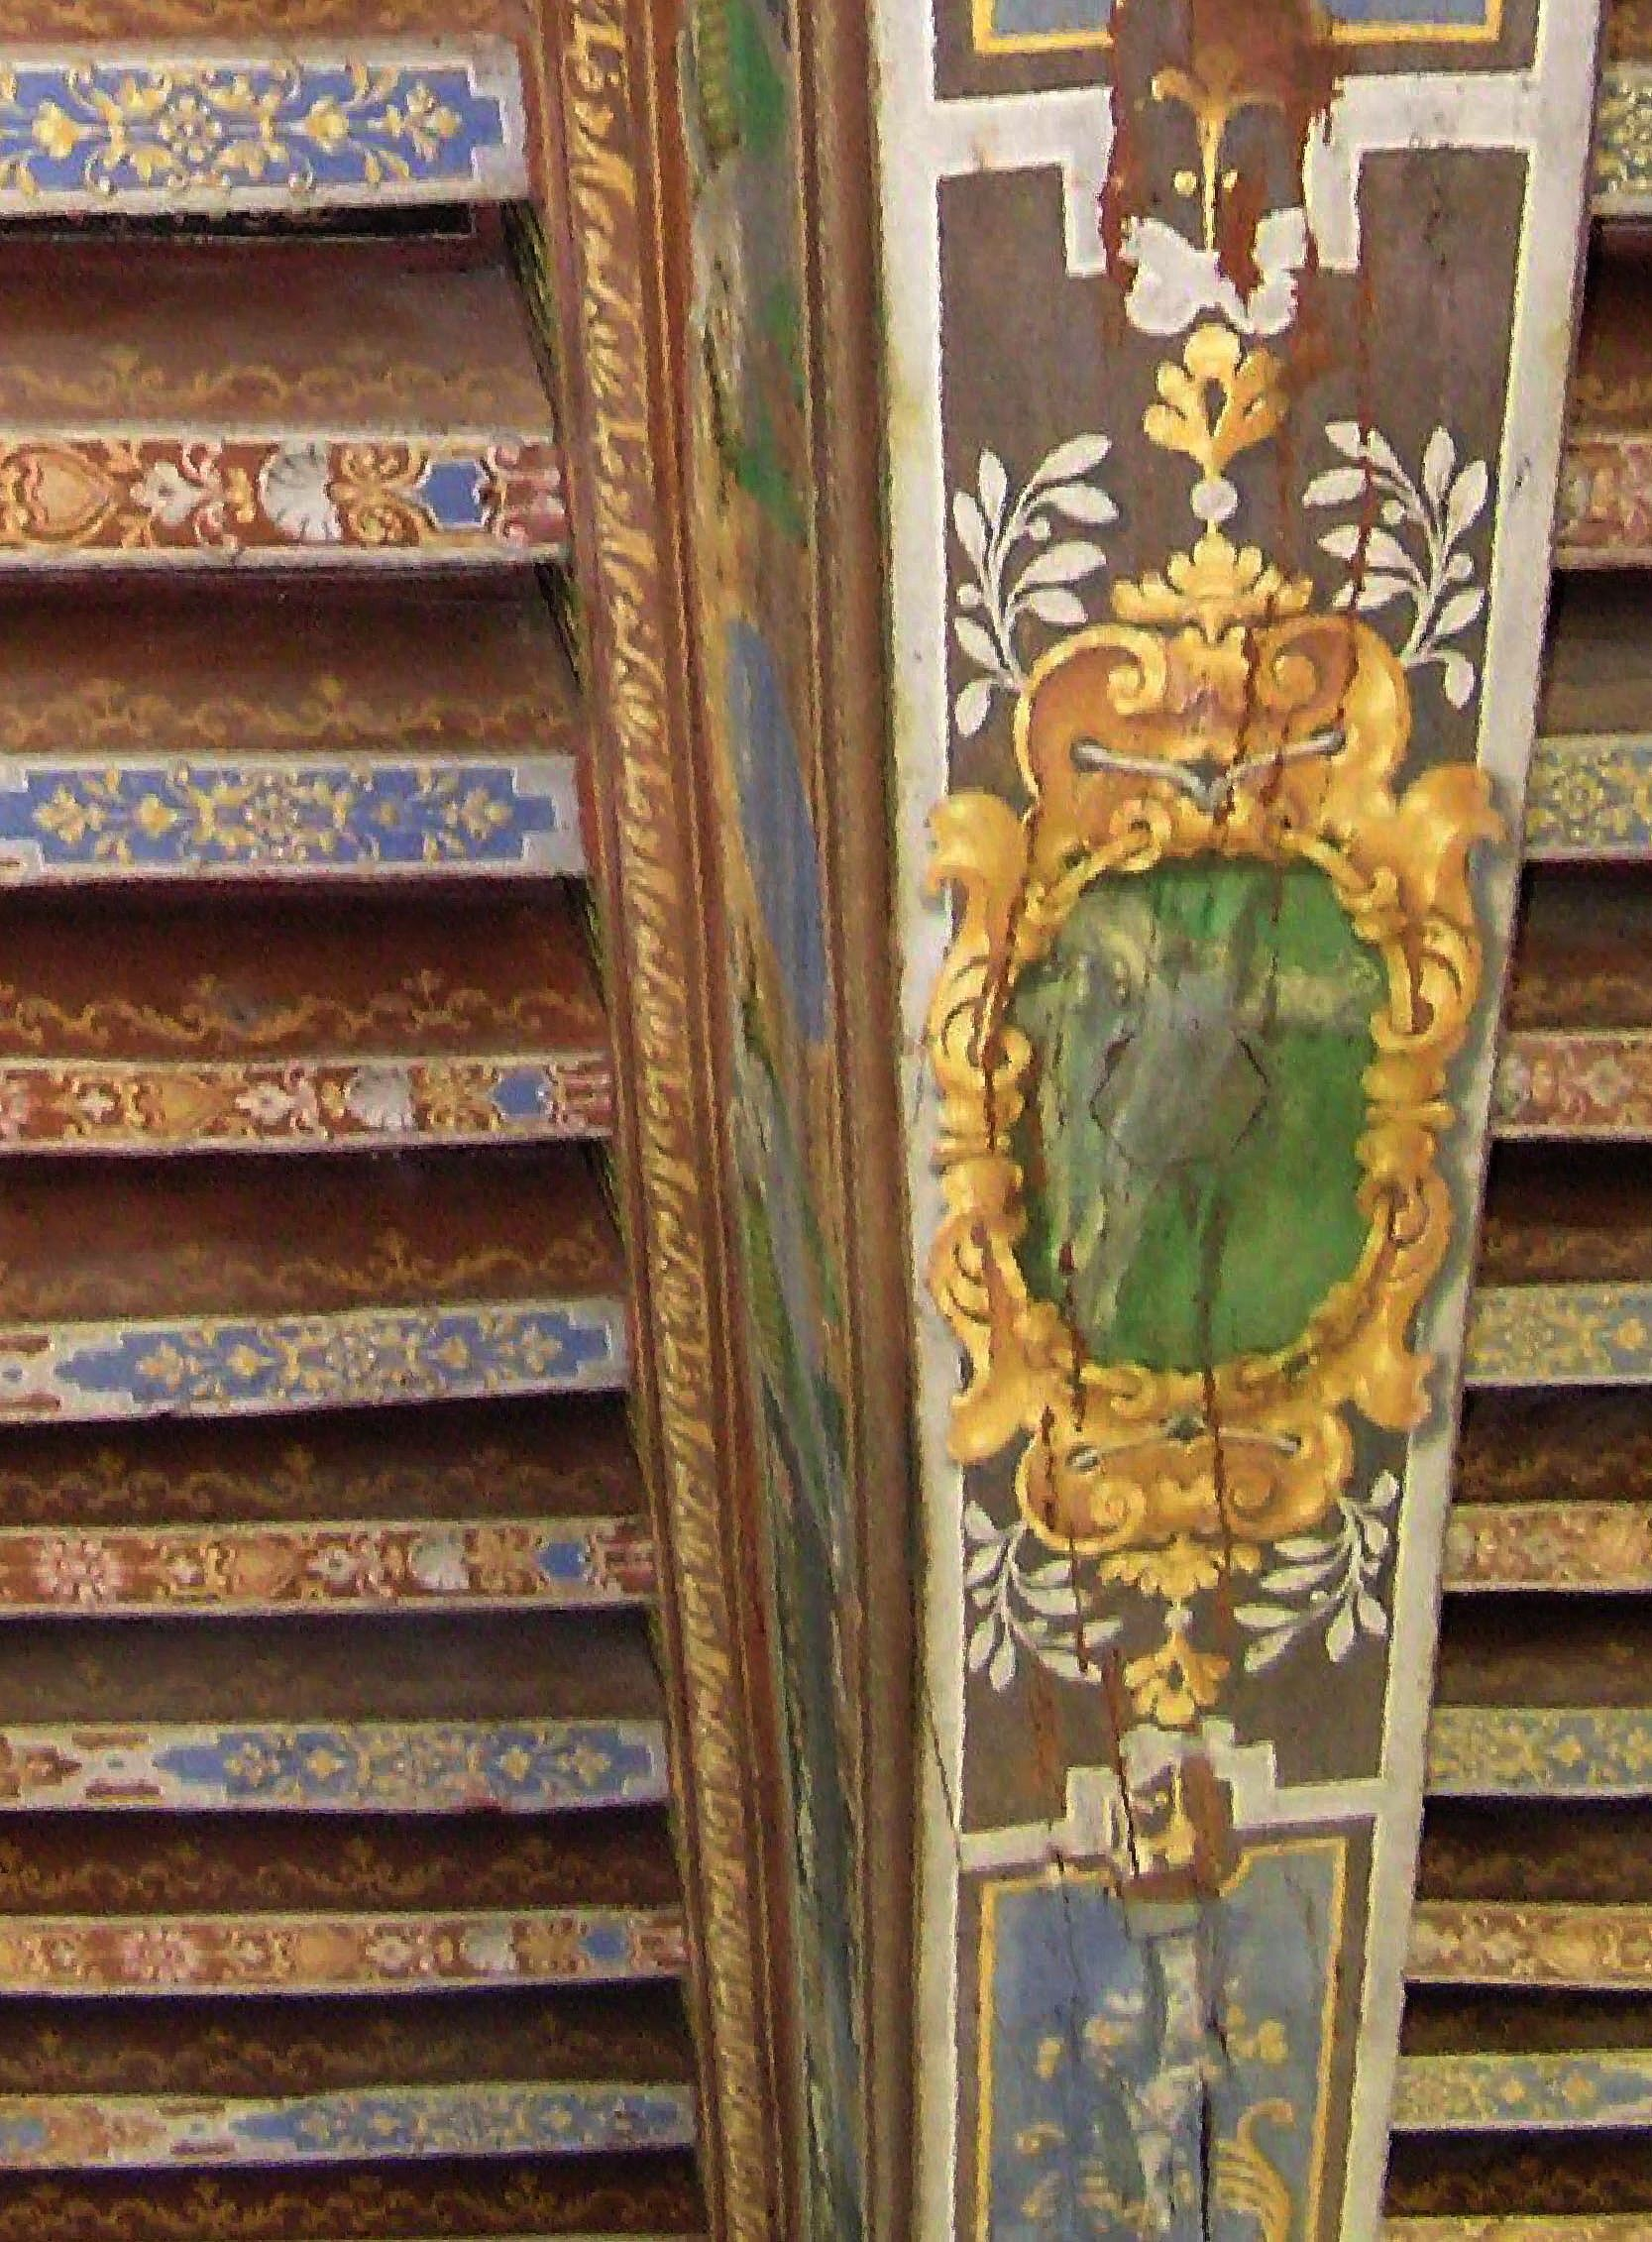 Vigas decoradas tapices alfombras papel murales cortinas textiles pavimentos cojines - Murales de madera ...